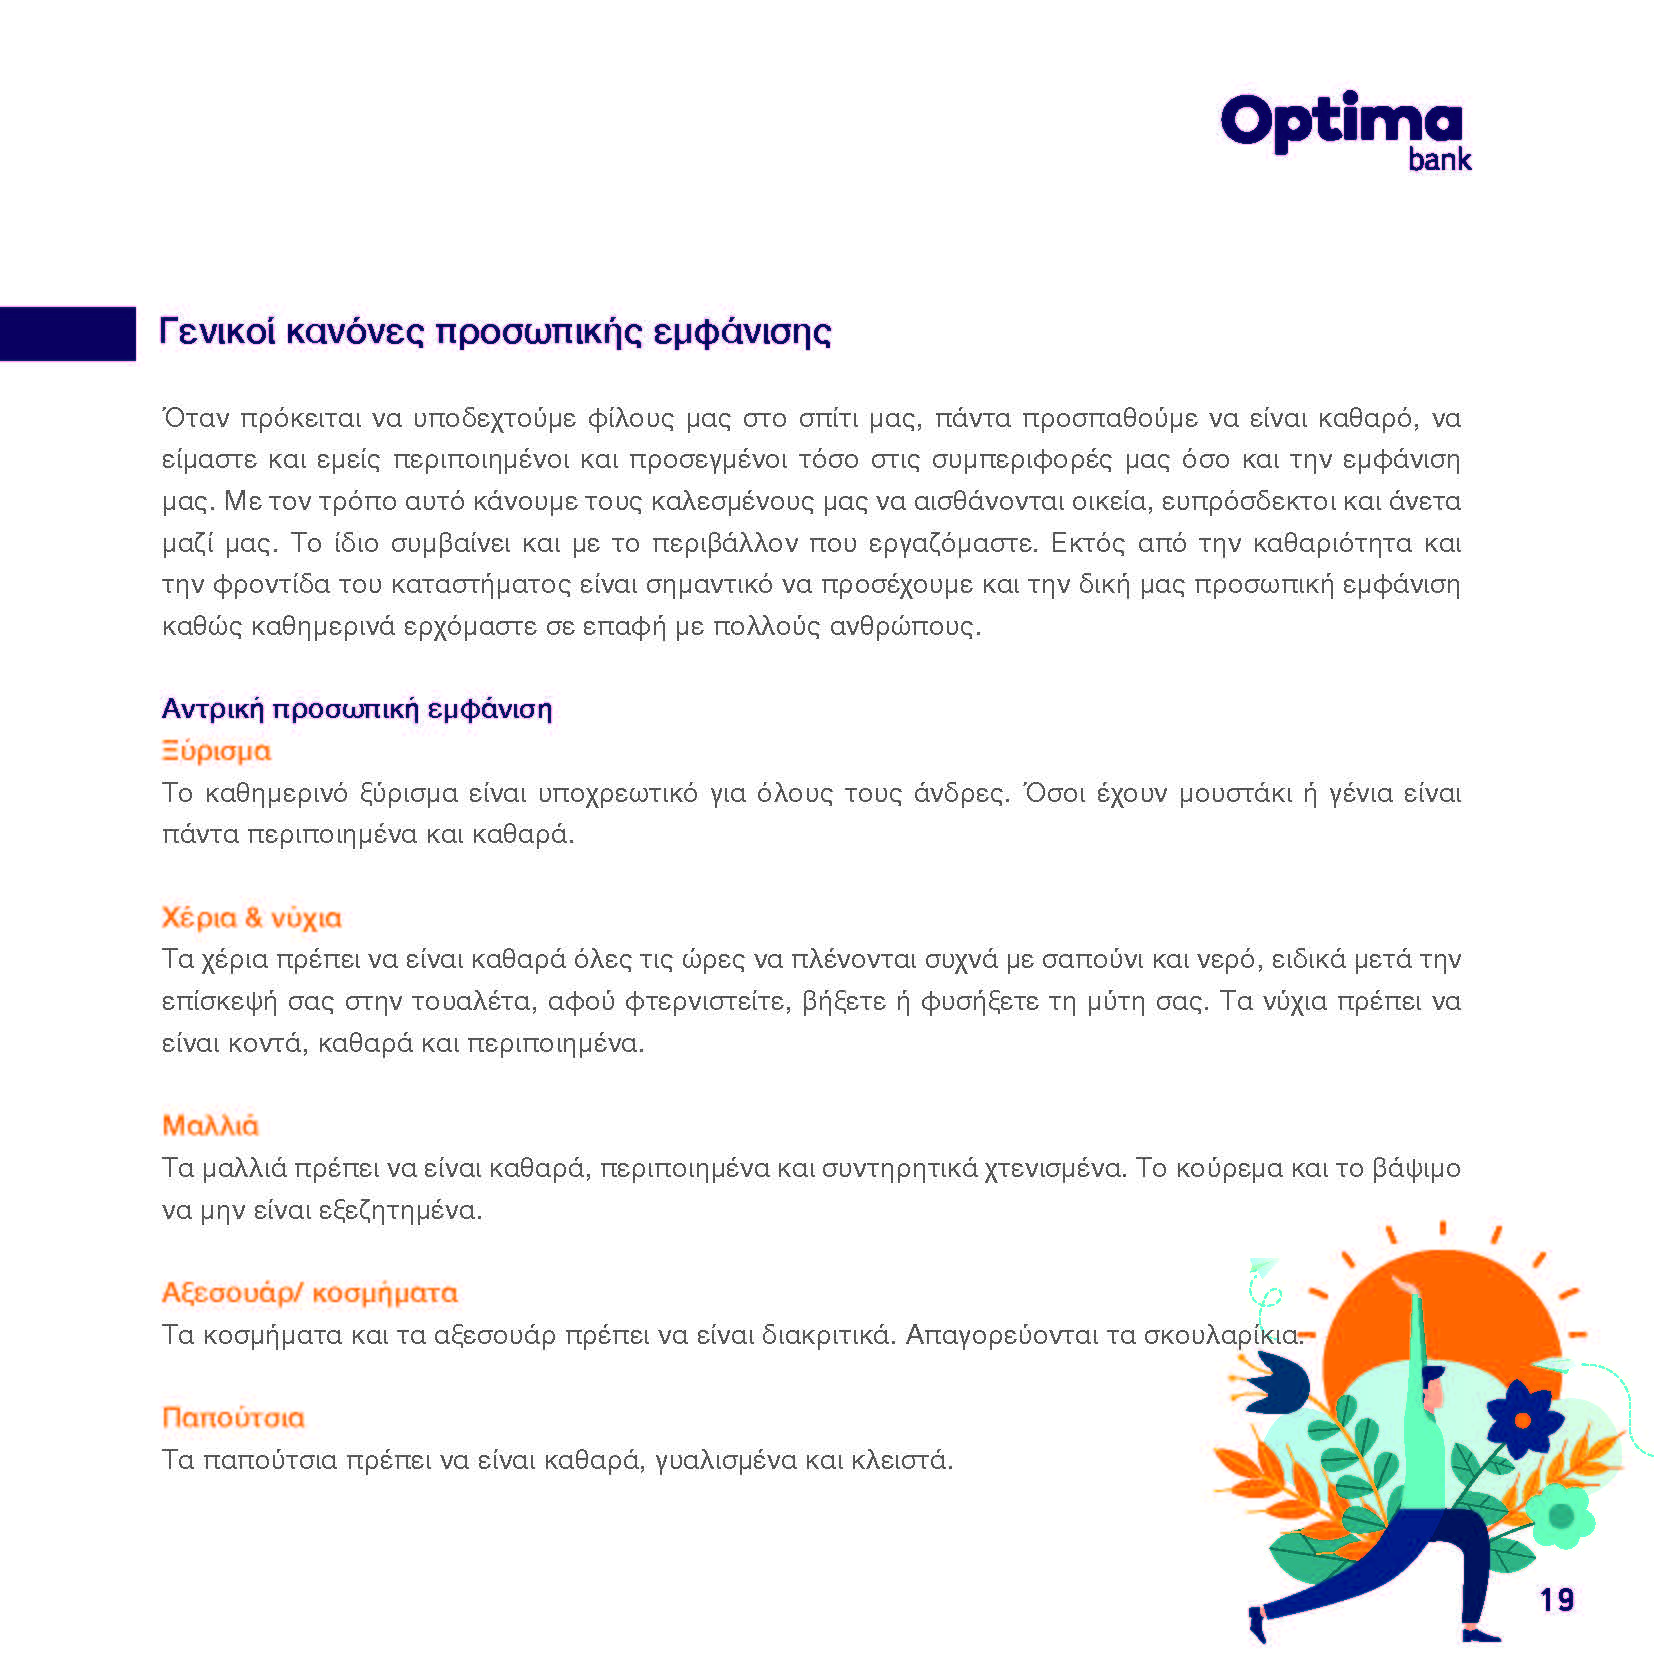 https://www.jib.gr/wp-content/uploads/2020/09/OPTIMA-BANK-BOOKLET-WEB_Page_019.jpg